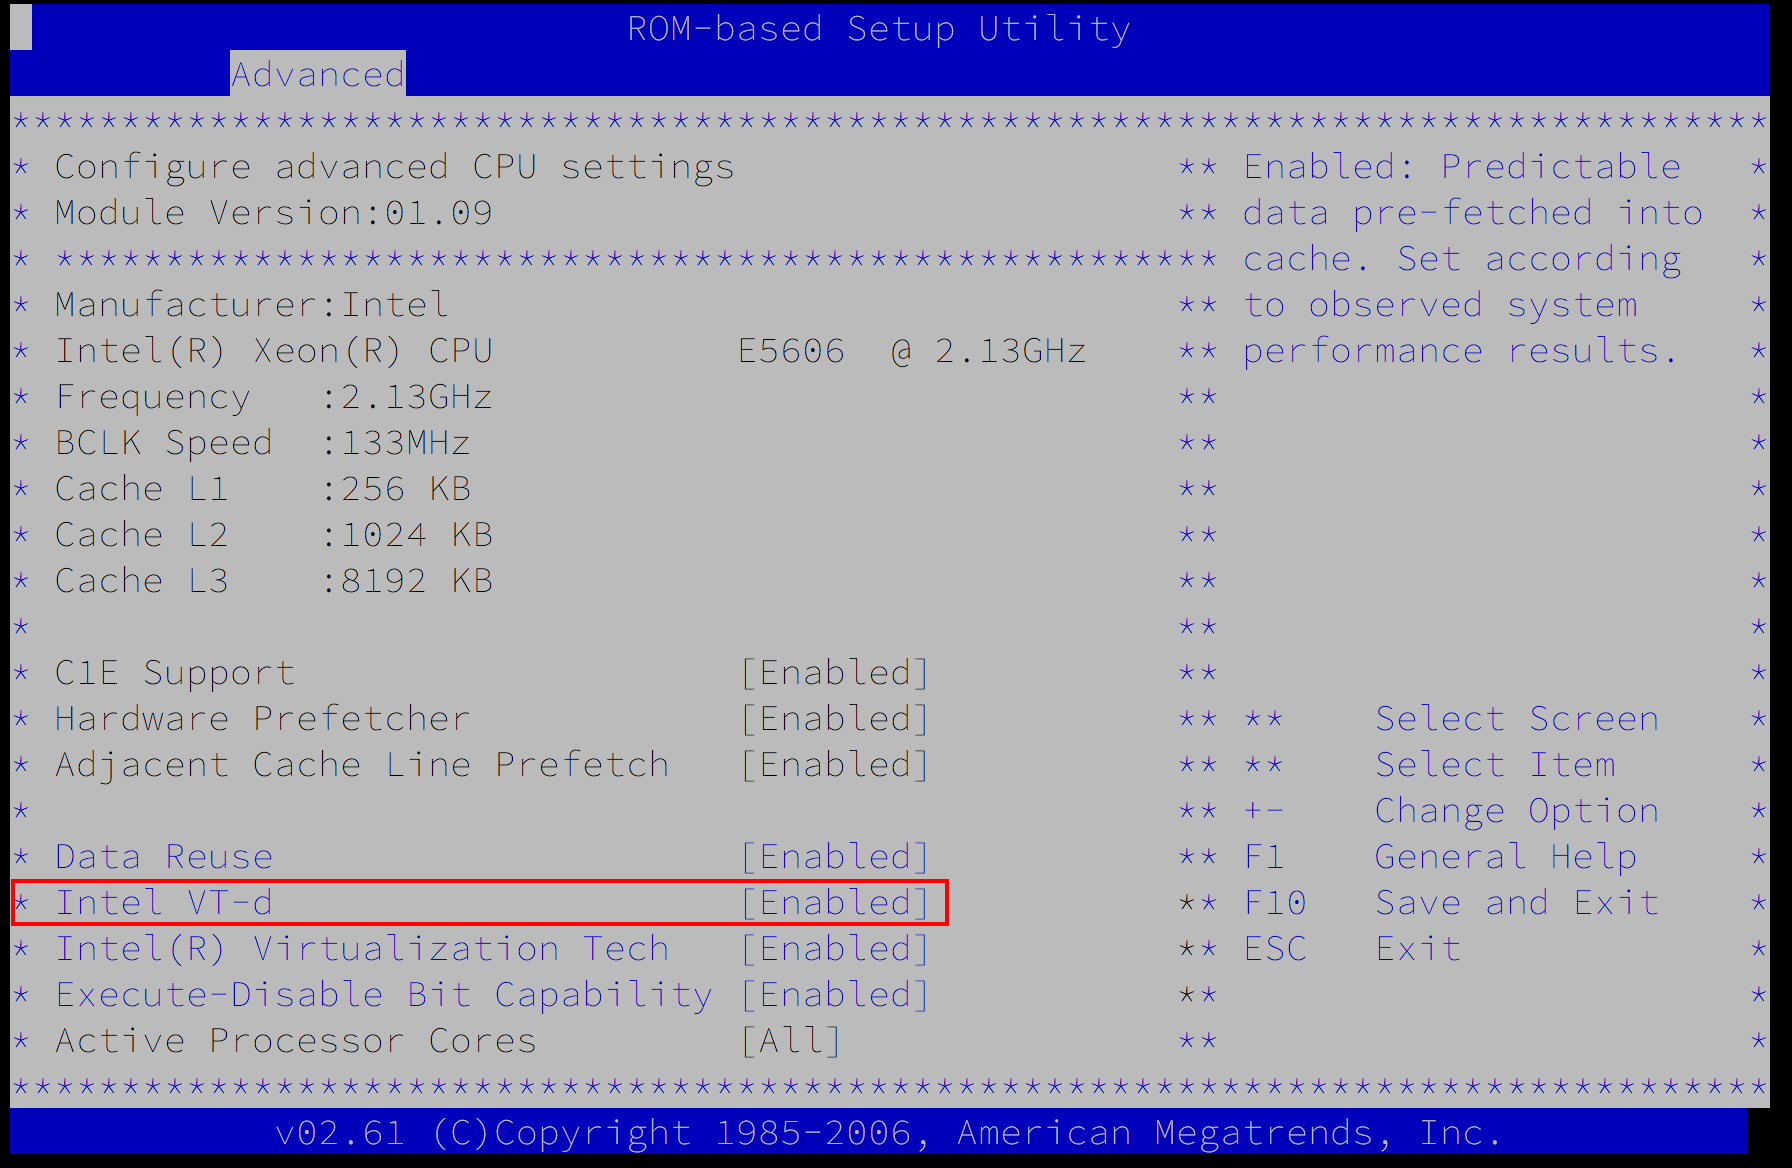 hostdev passthrough - PCI · mpolednik github io